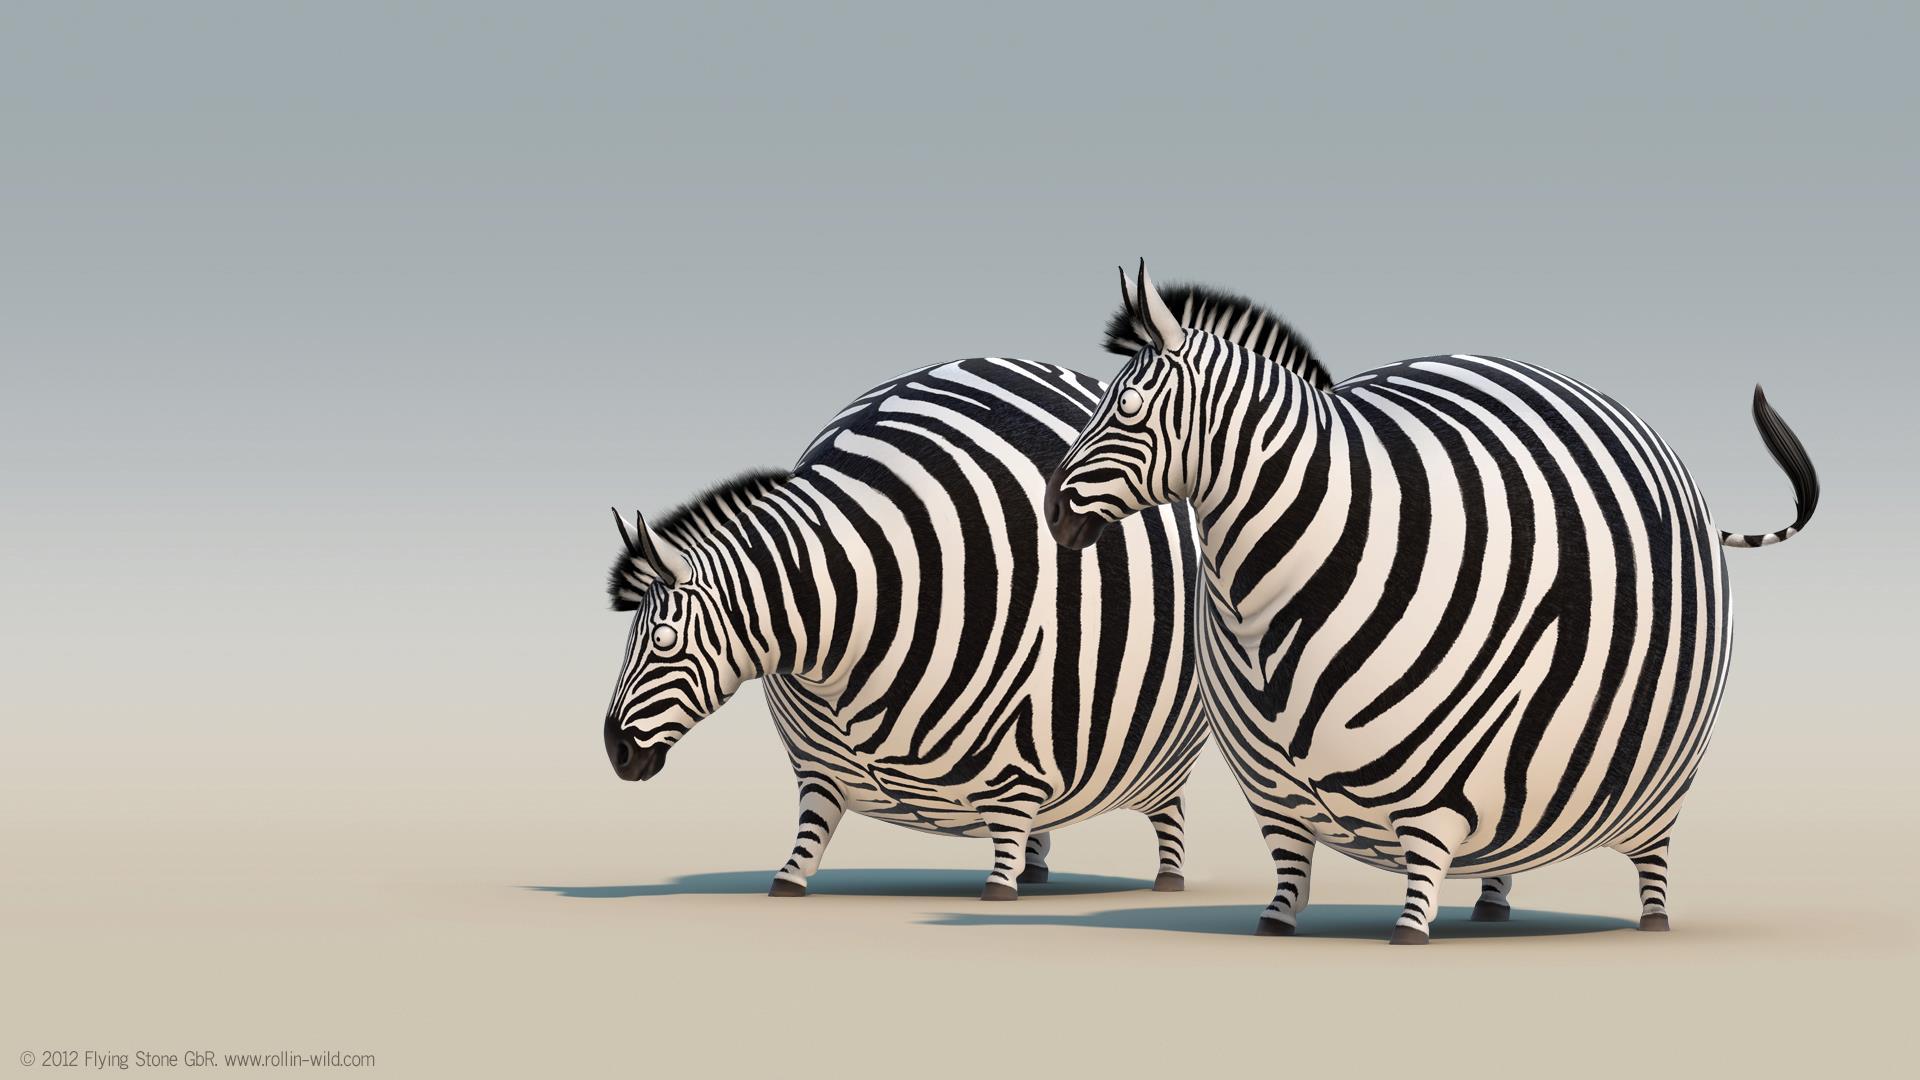 Rollin Wild Animasi Lucu Hewan Hewan Gendut – Mobgenic